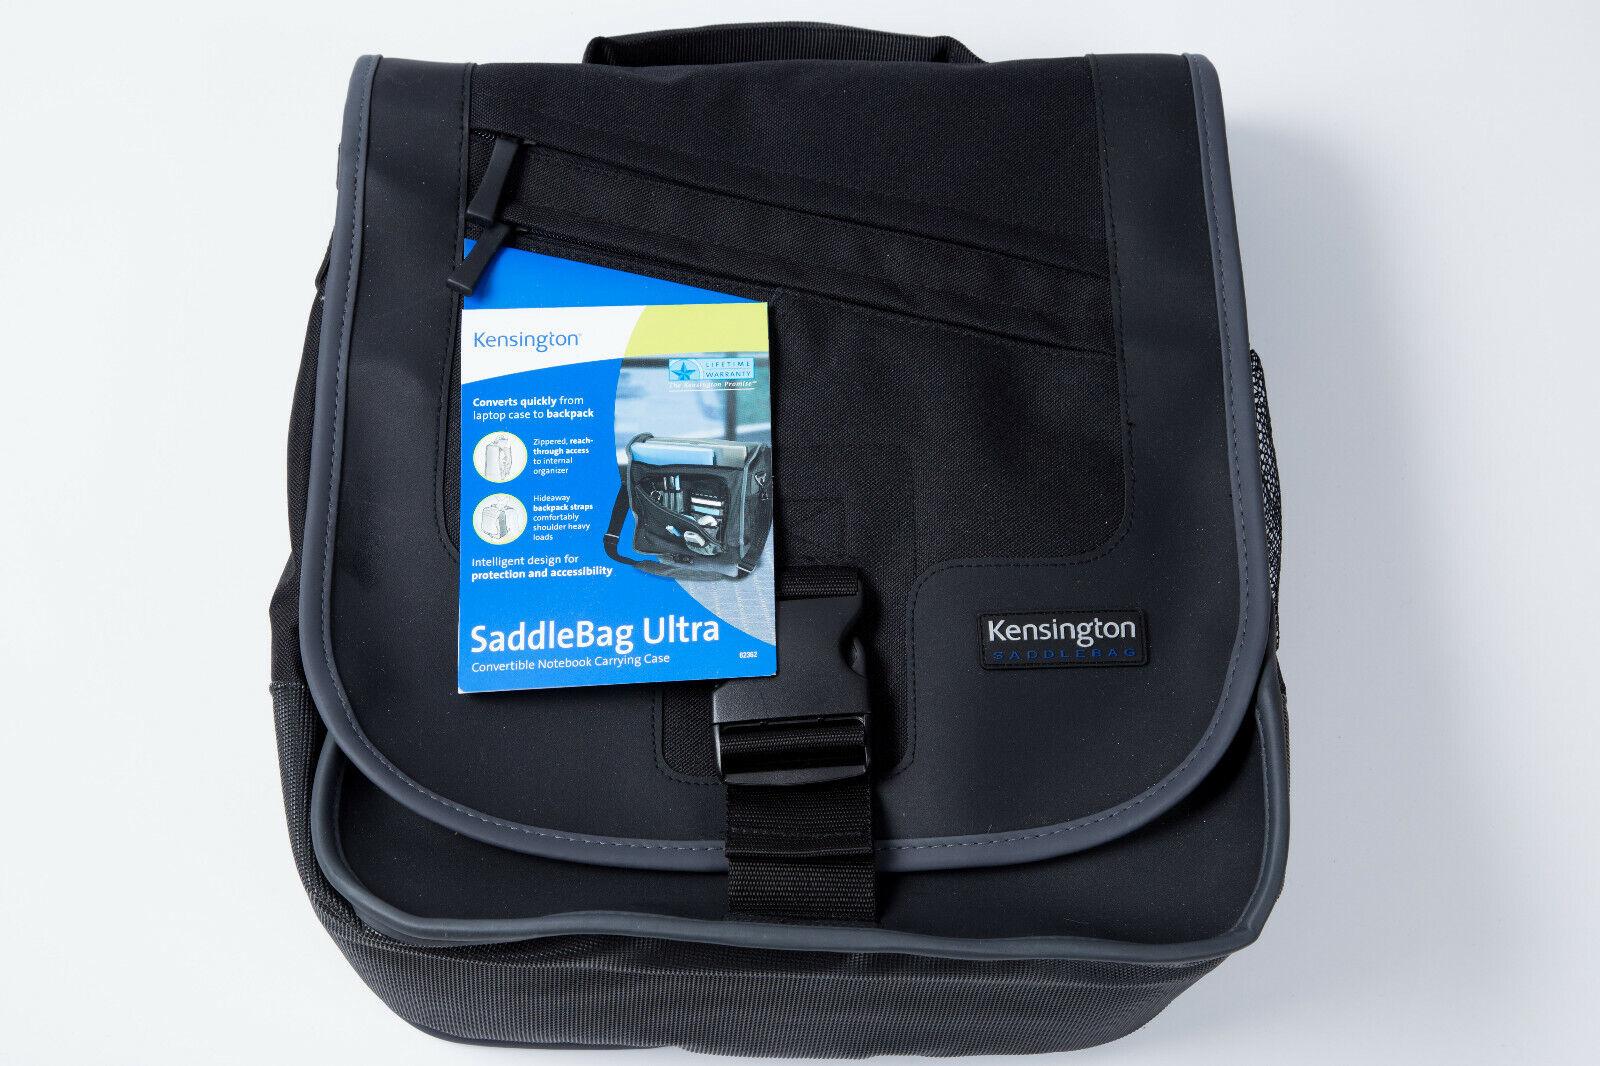 NWT - Kensington SaddleBag Ultra Convertible Notebook Carryi